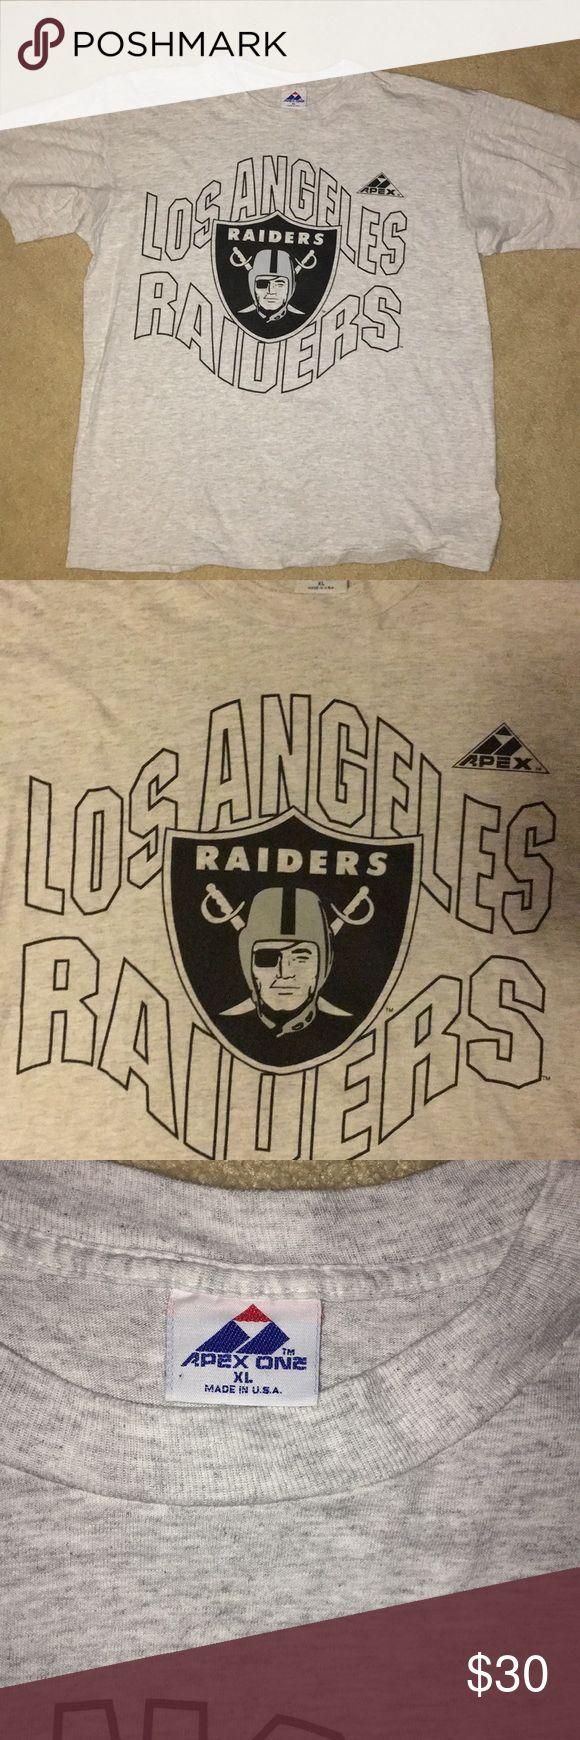 "Los Angeles Raiders Vintage Tshirt Men's Heather gray vintage Los Angeles Raiders Tshirt, size XL, perfect condition by brand ""apex"" . Oakland Raiders, las Vegas Raiders, raiders, Los Angeles, Dodgers. Vintage Shirts Tees - Short Sleeve"